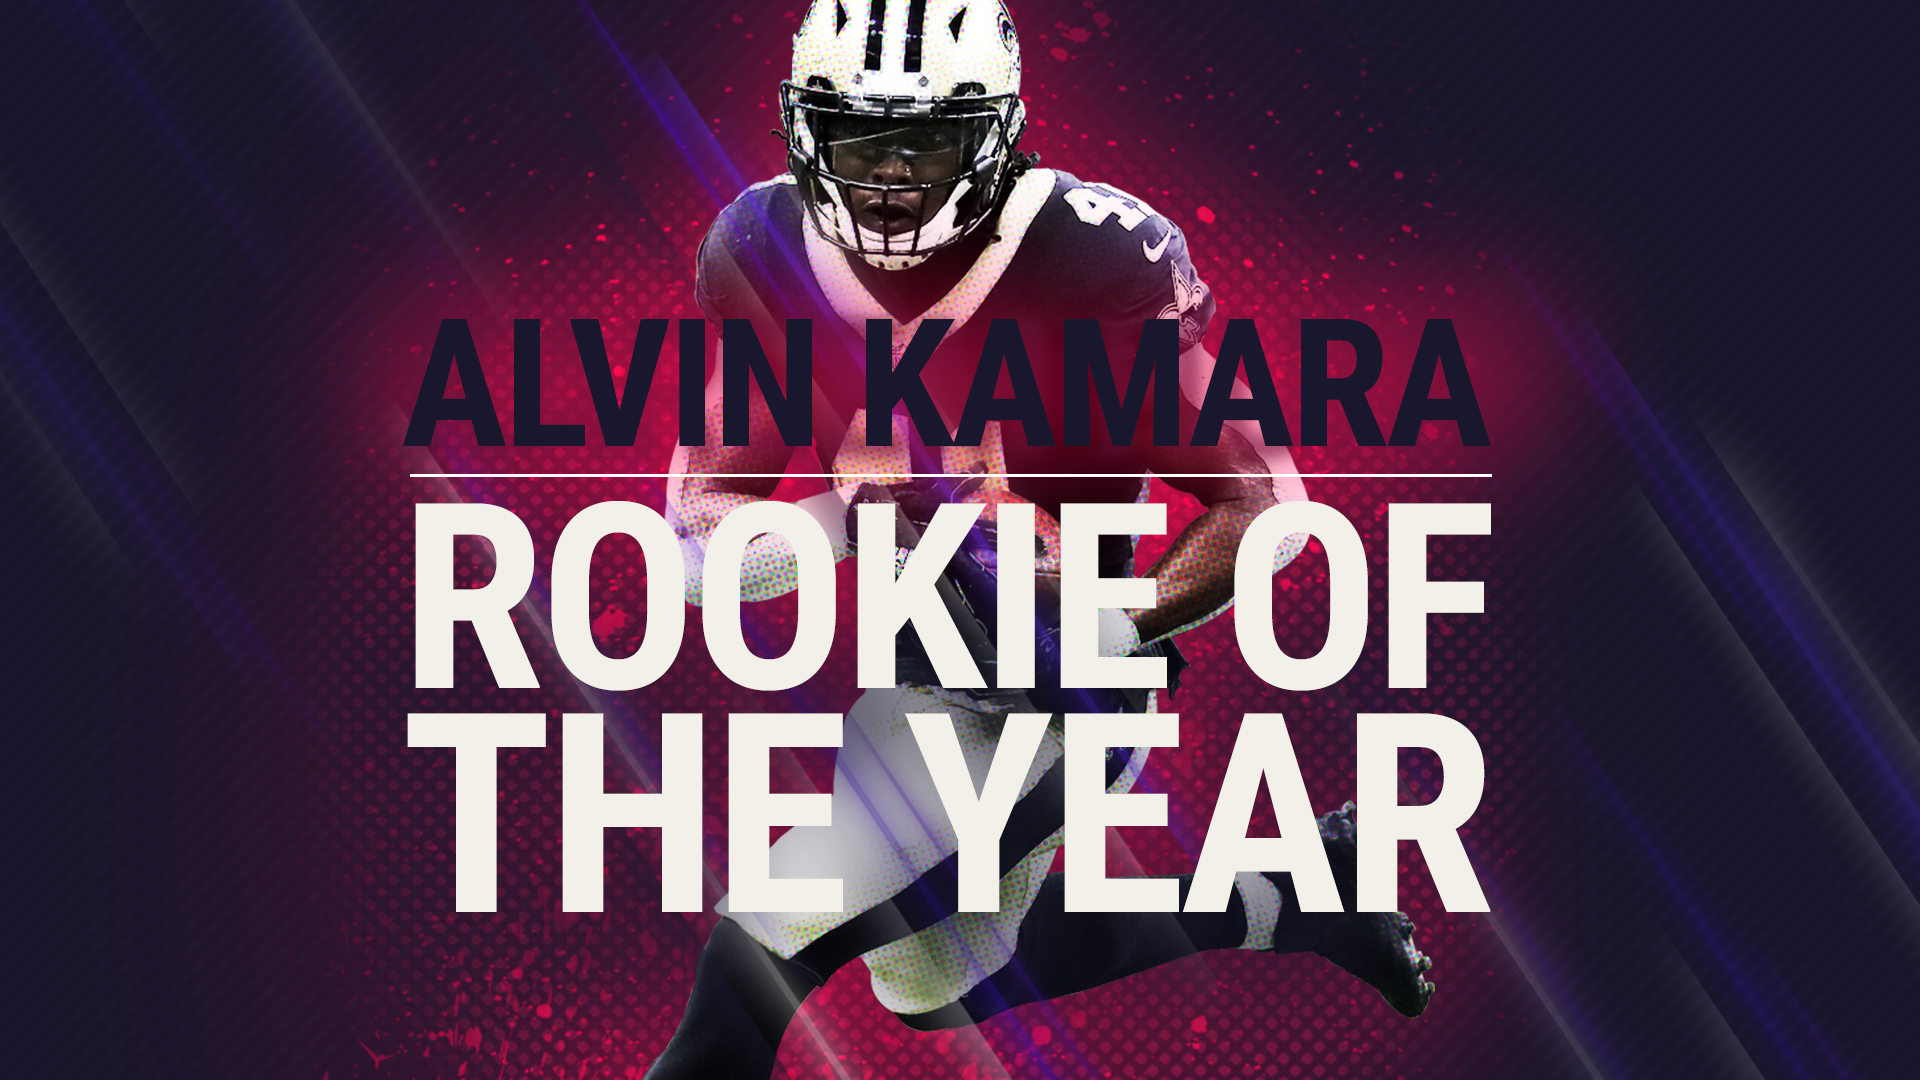 Alvin Kamara Wallpaper Saints >> NFL players vote Alvin Kamara Sporting News Rookie of the Year for ...